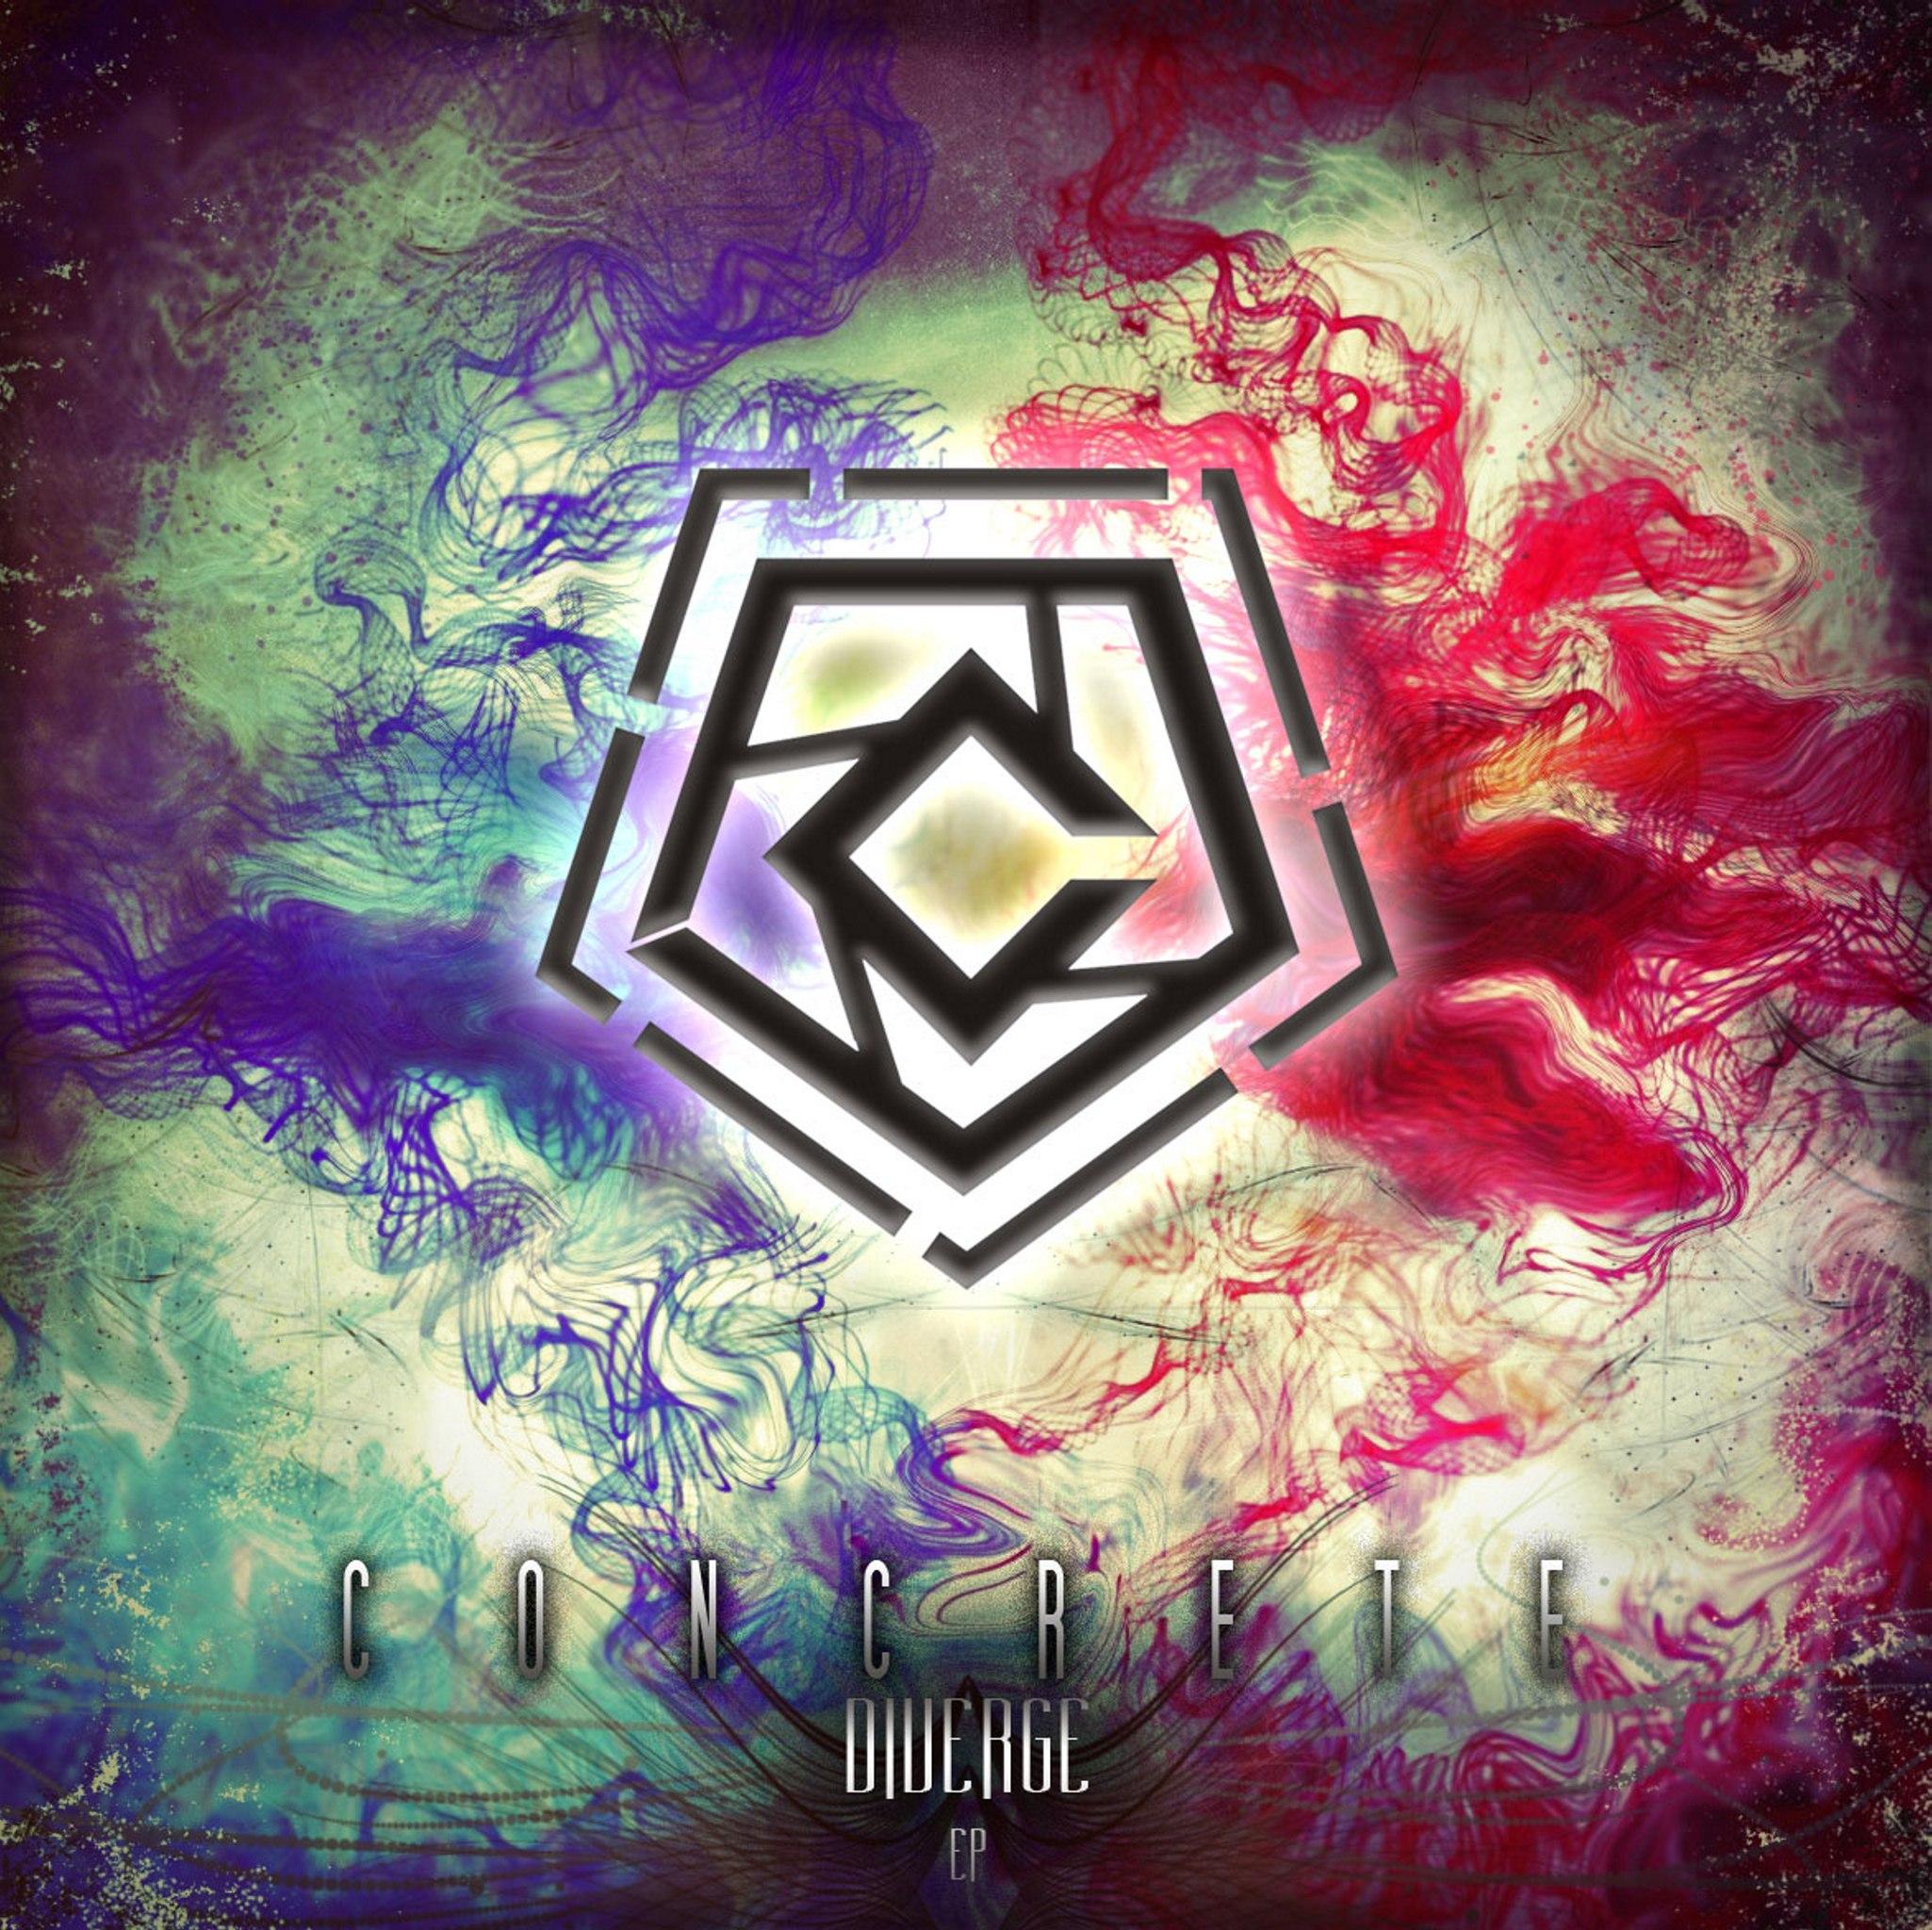 Concrete - Diverge [EP] (2012)